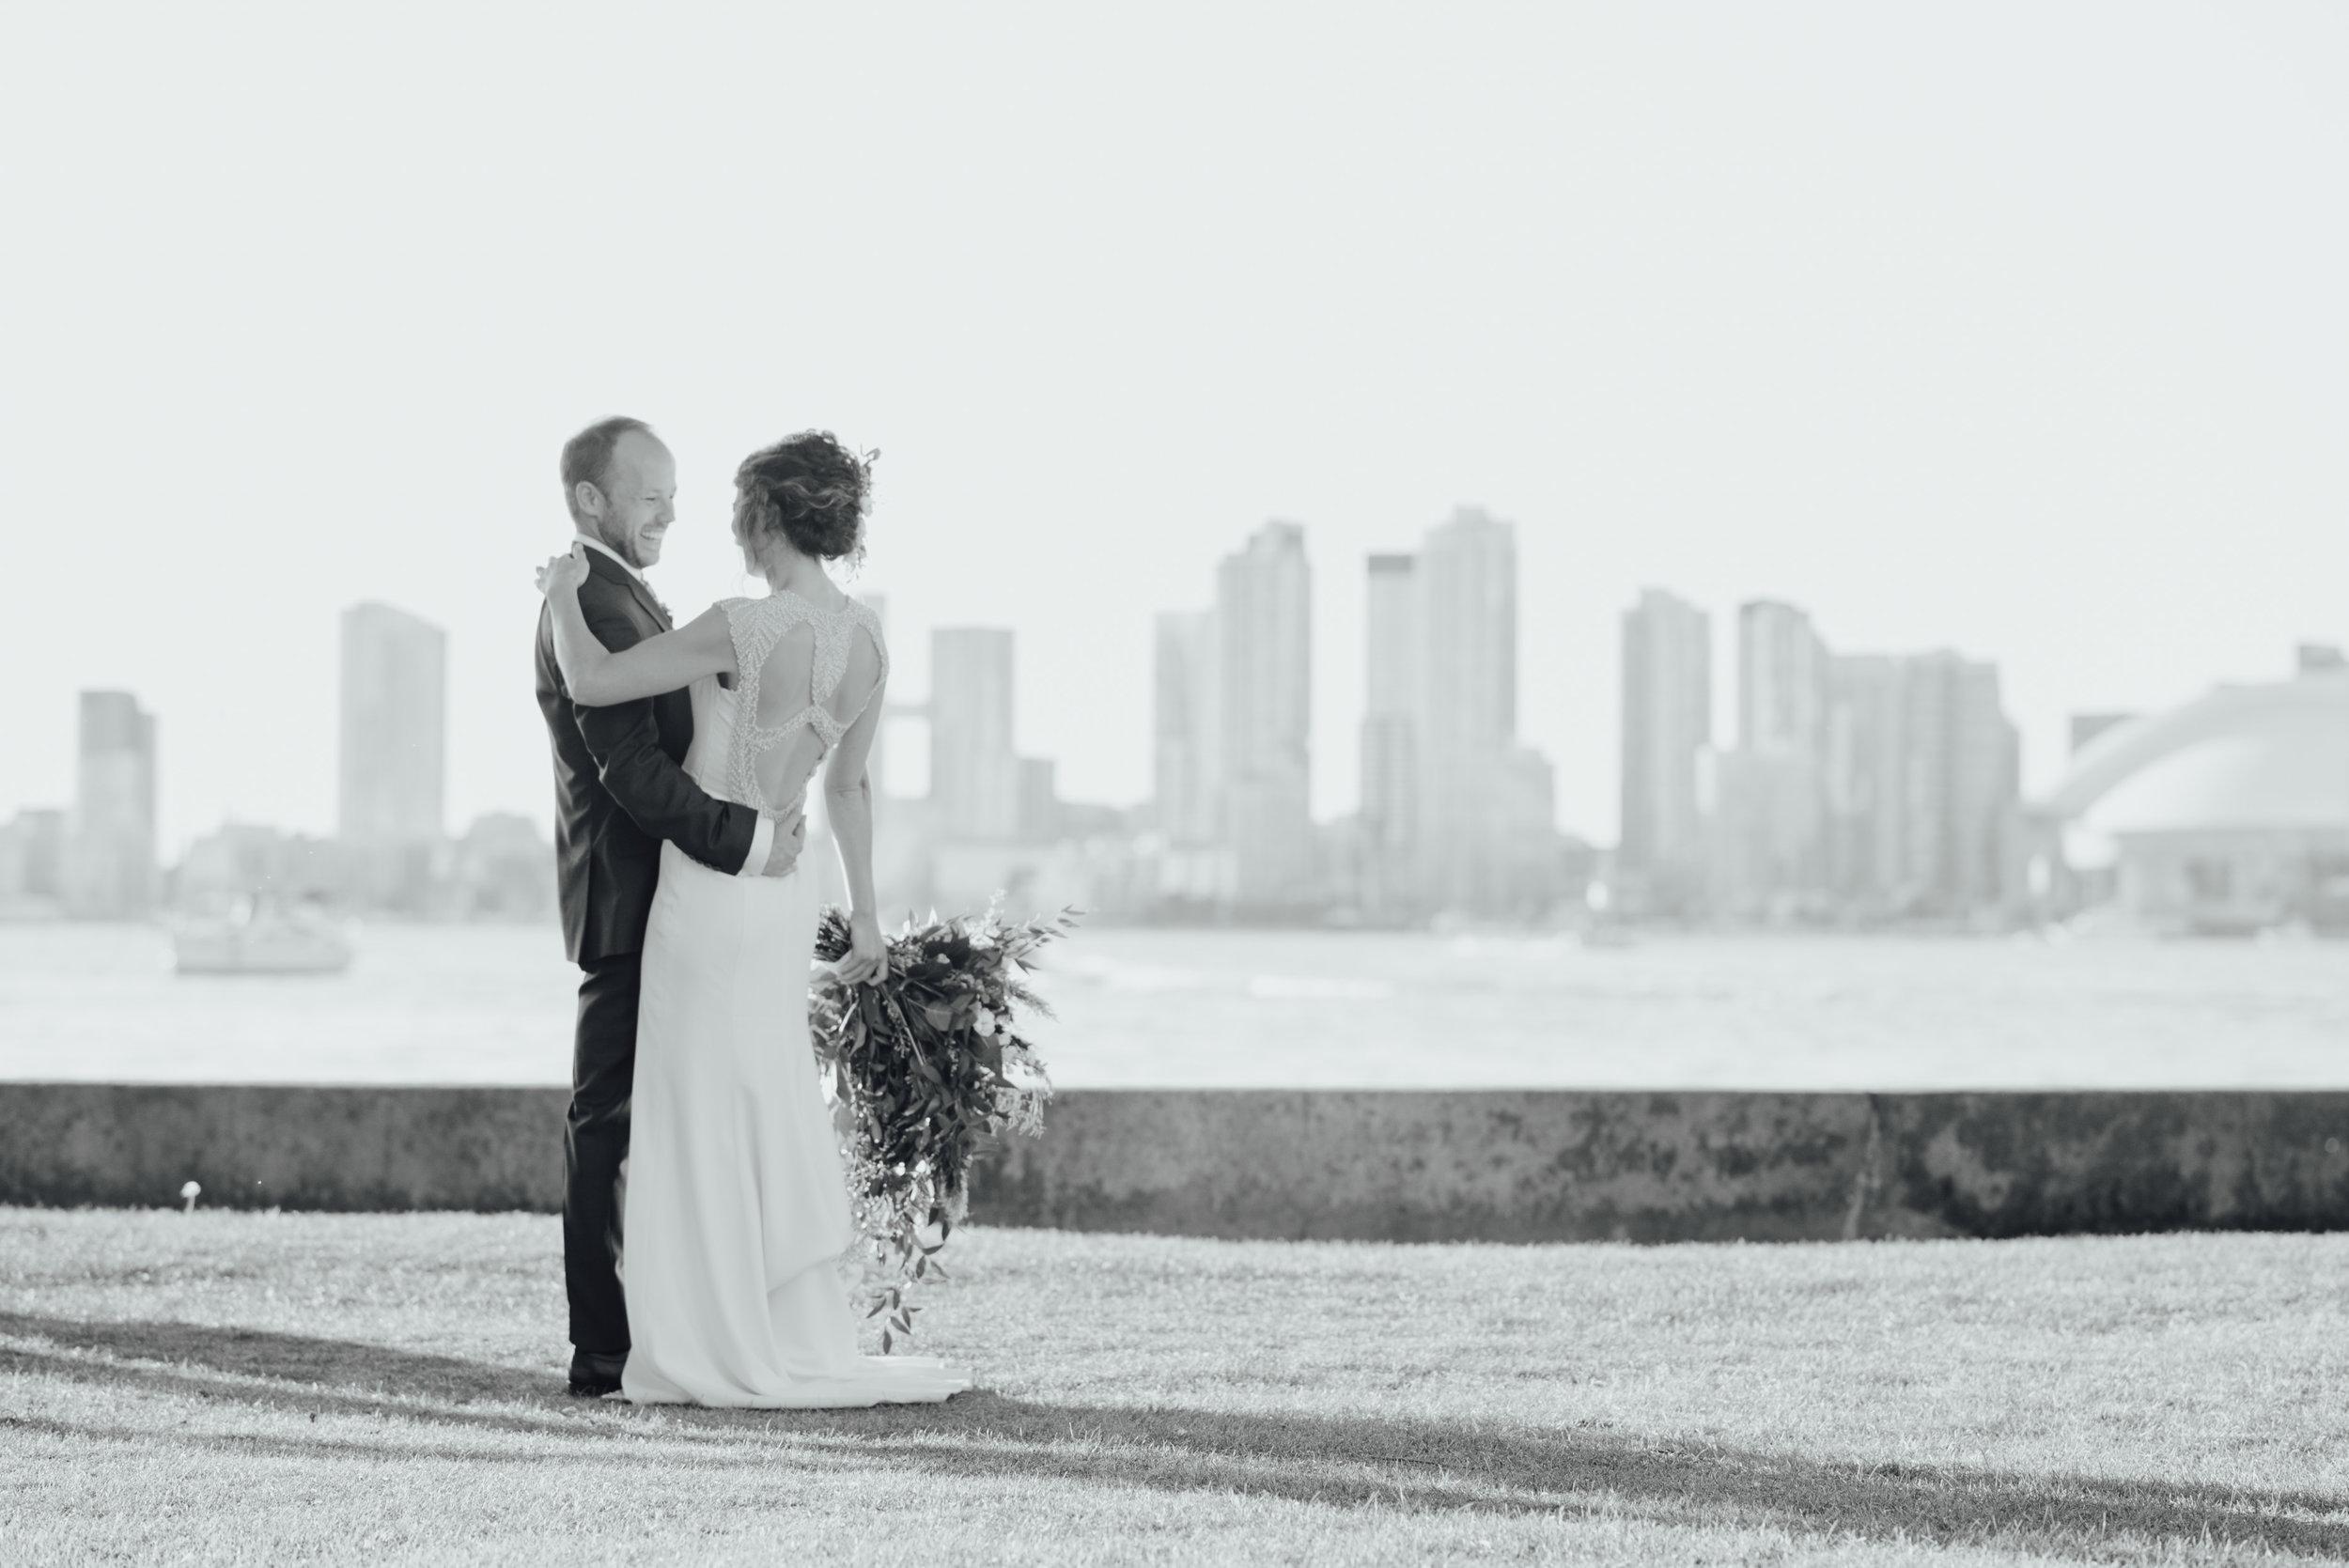 cleland-studios-wedding-photography-63.jpg